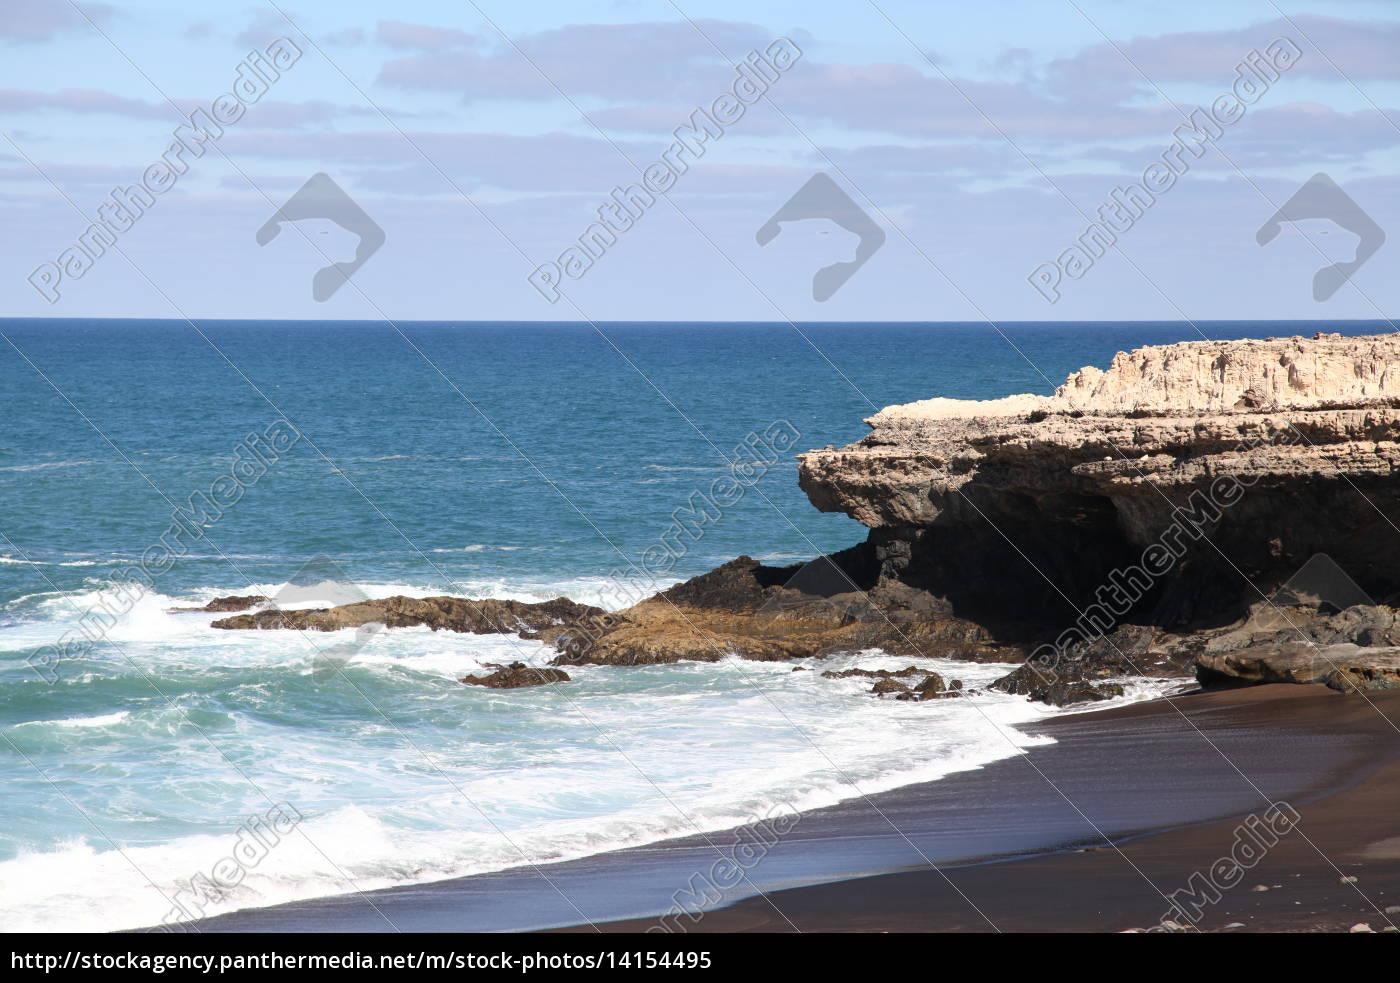 atlantic ocean, salt water, sea, ocean, water, canary islands - 14154495